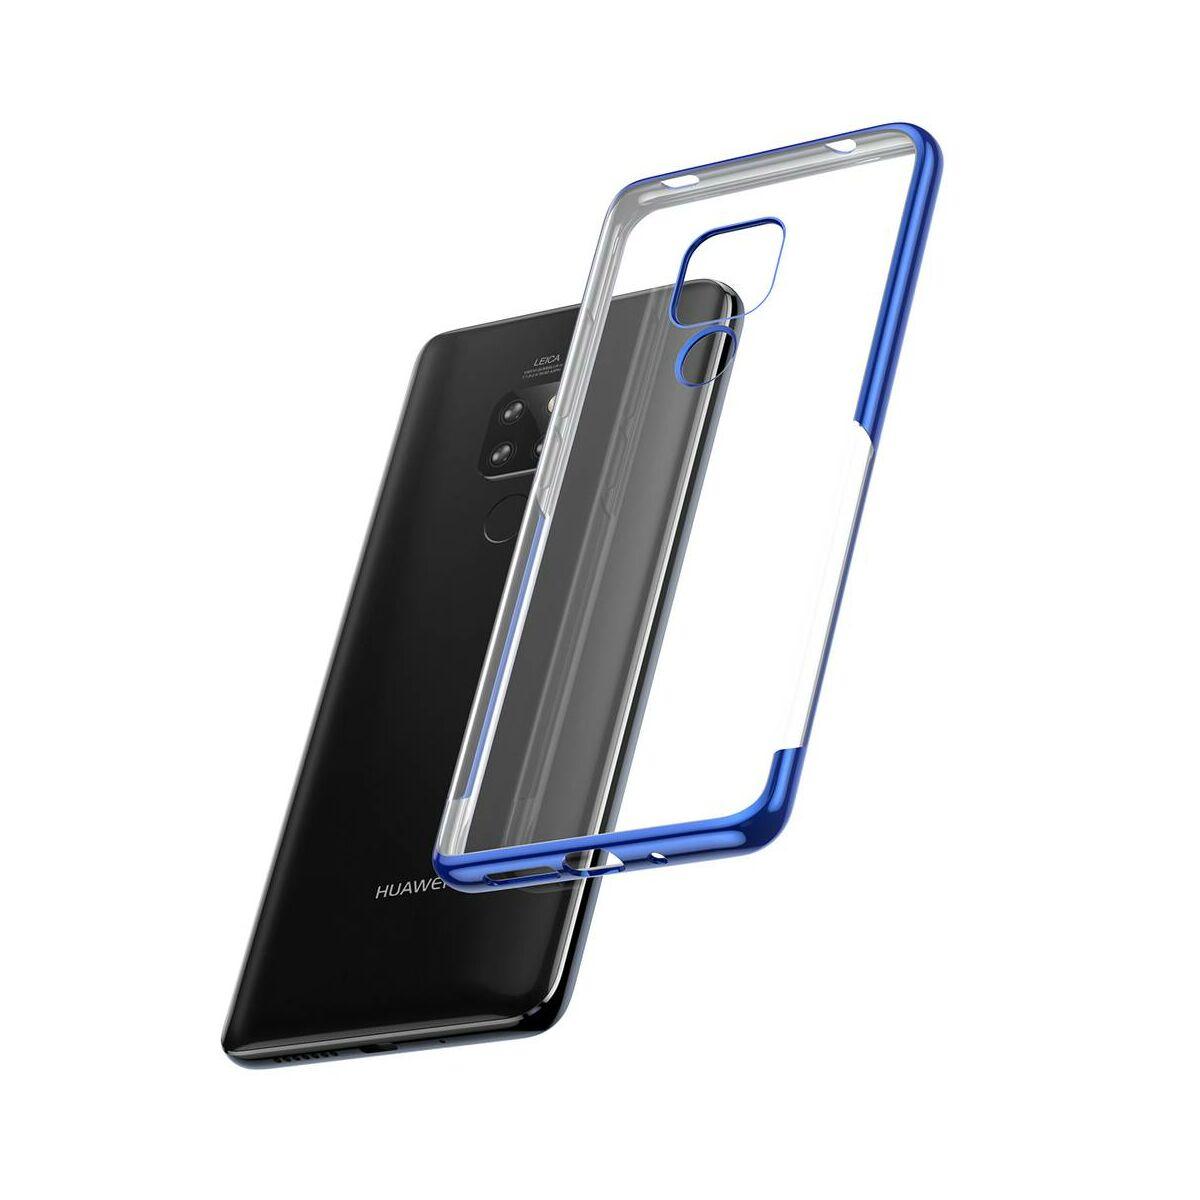 Baseus Huawei Mate 20 tok, Shining, kék (ARHWMate 20-MD03)